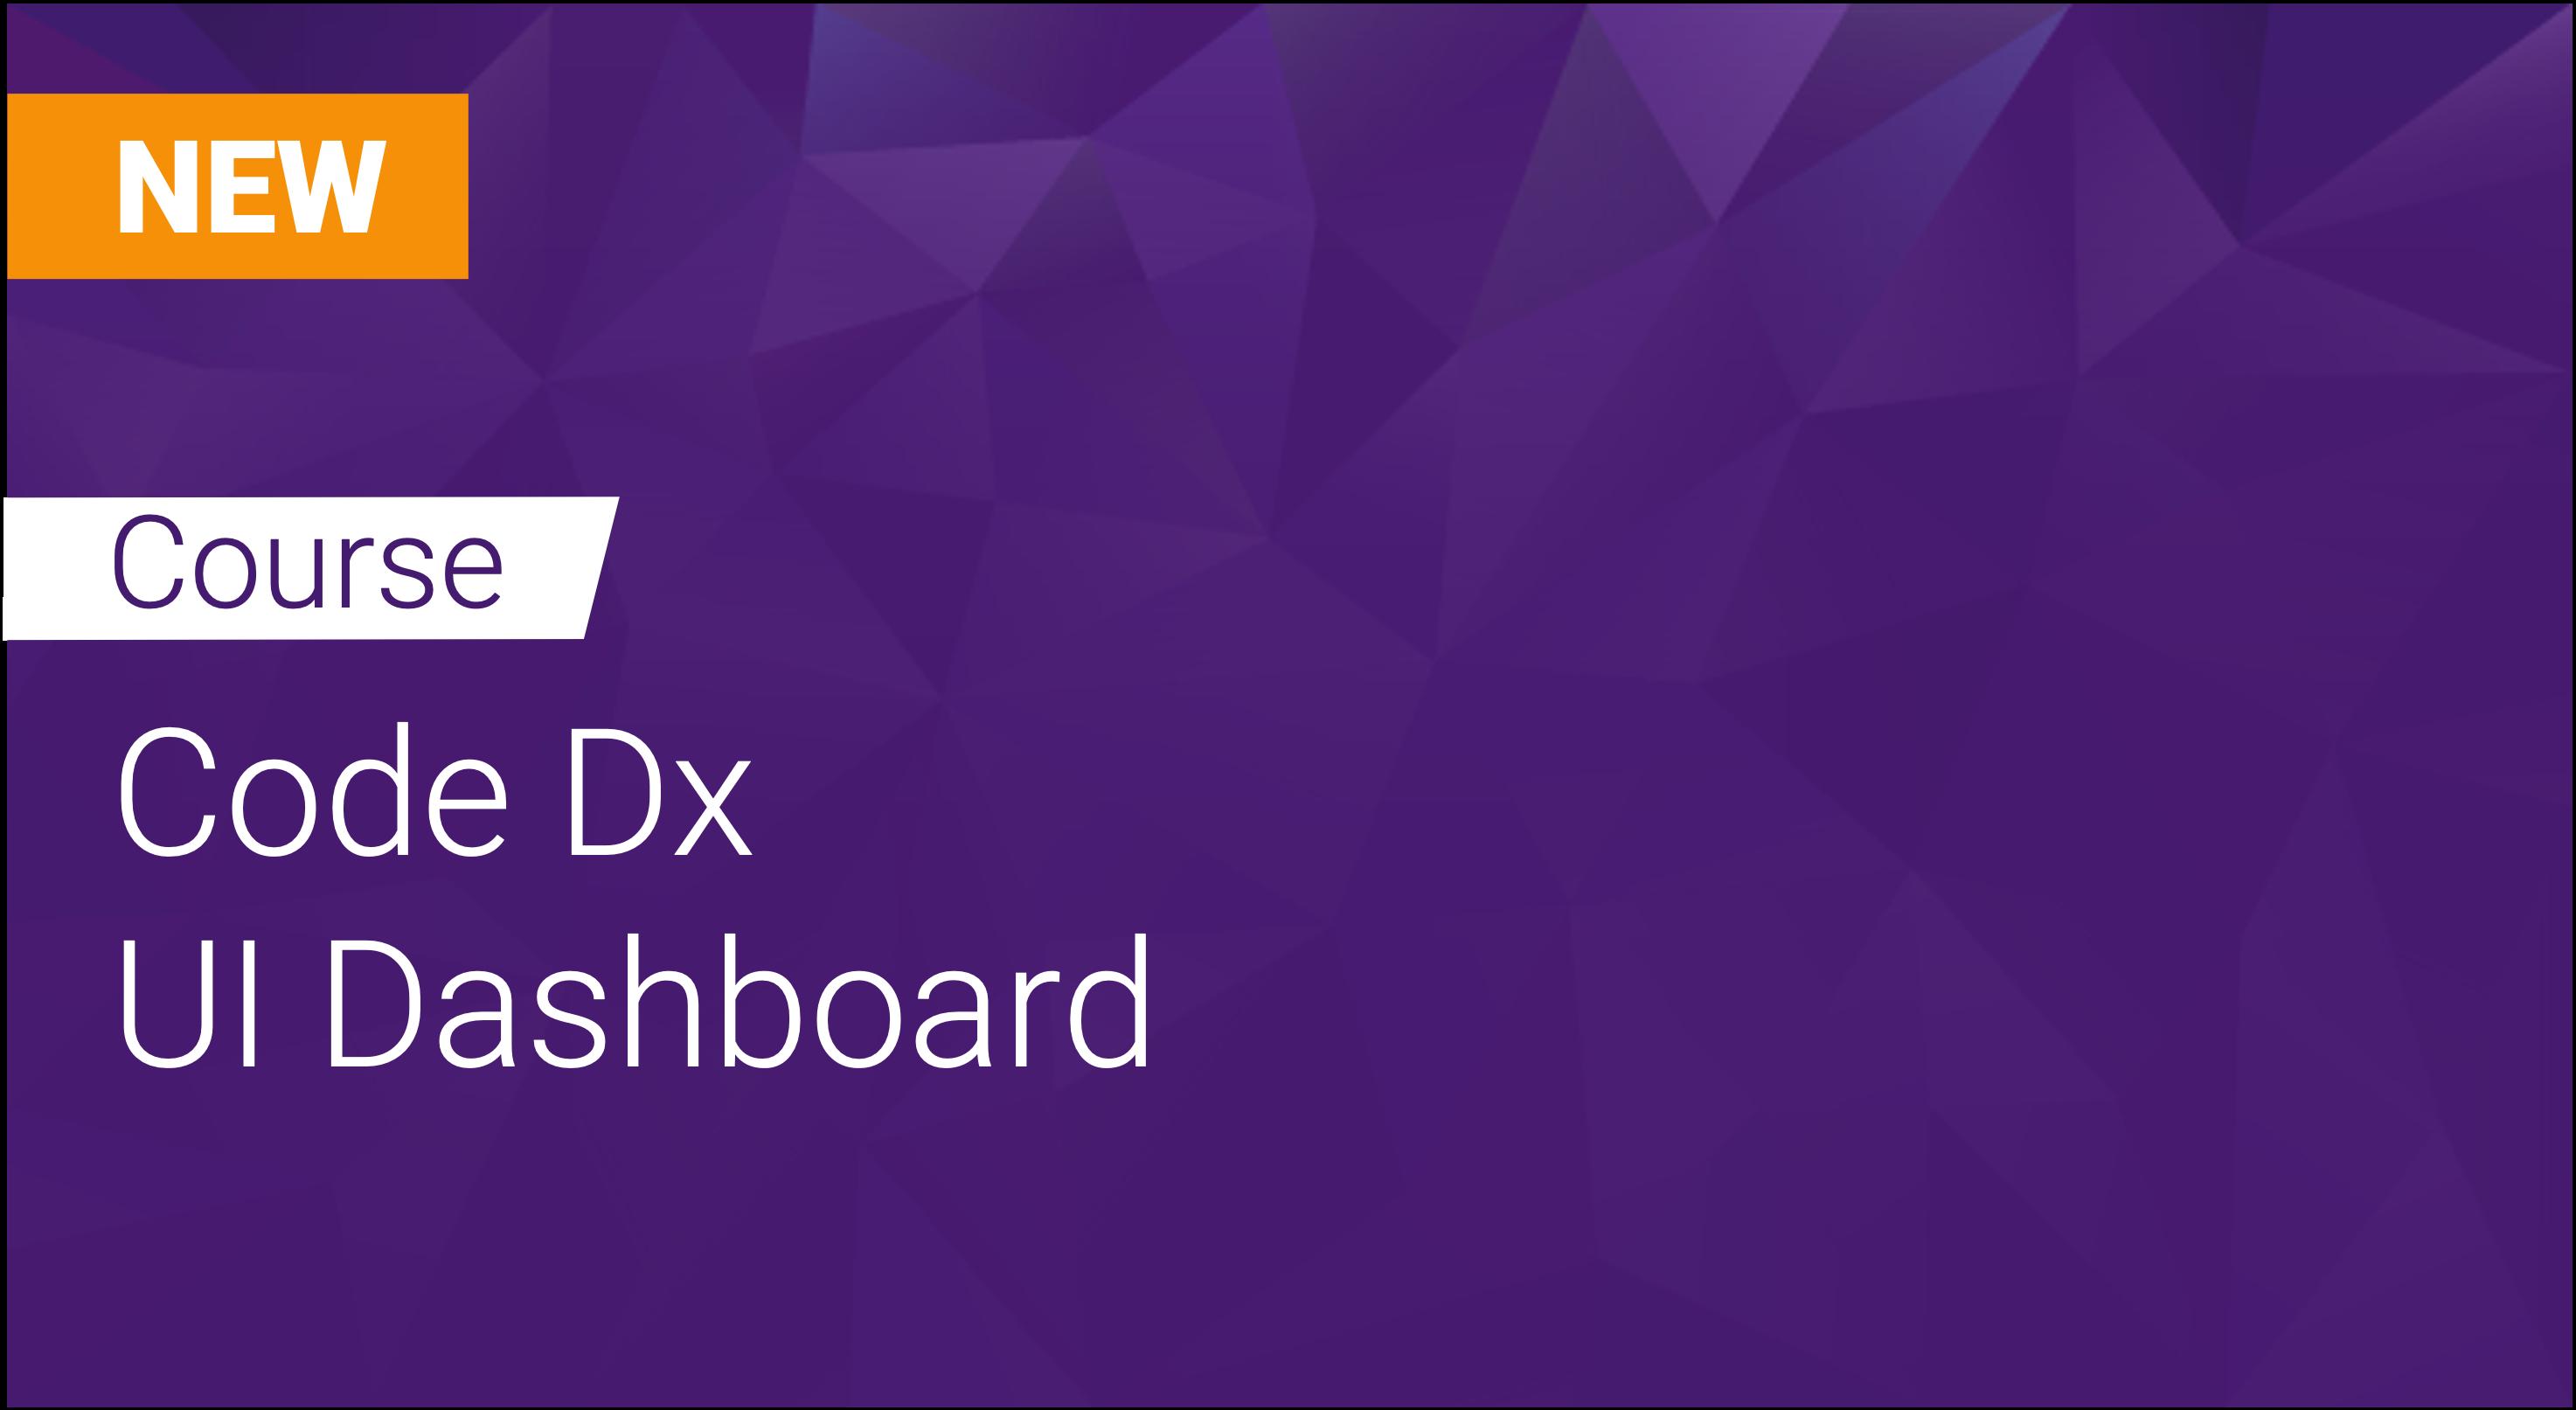 Code Dx: UI Dashboard